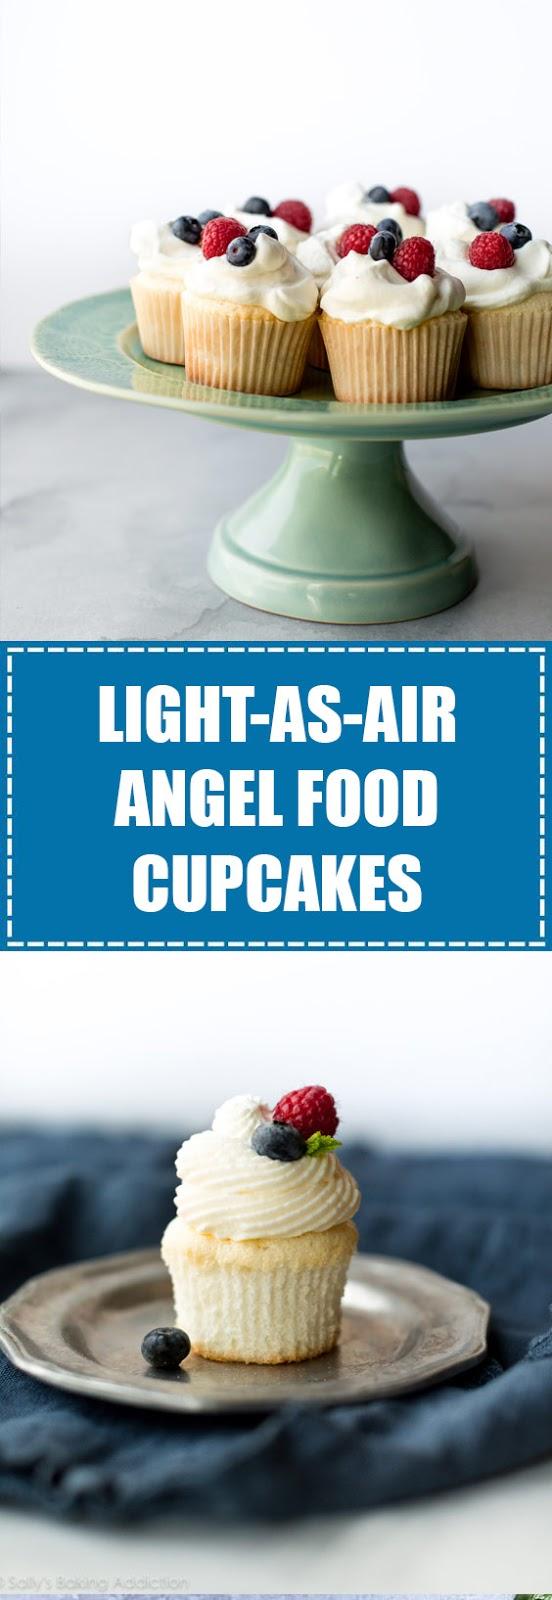 Light as Air Angel Food Cupcakes